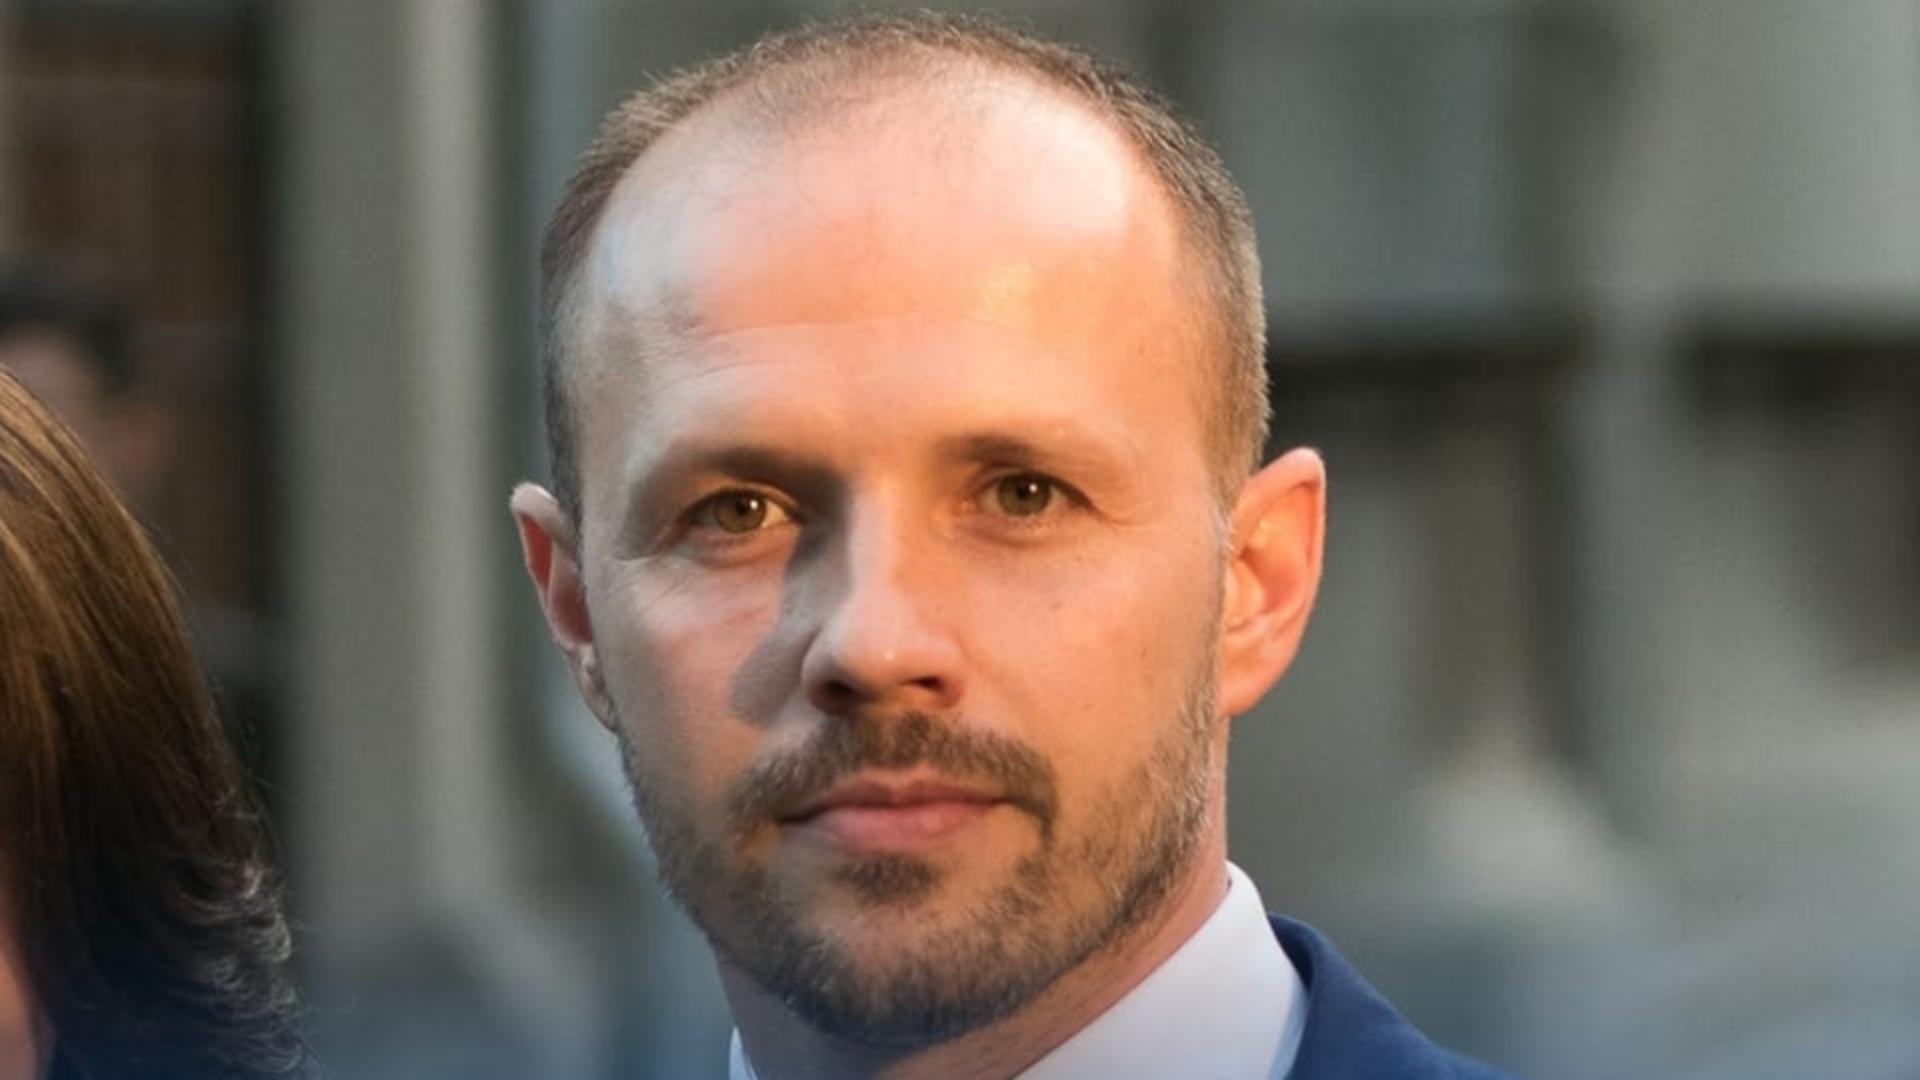 Alexandru Kocsis